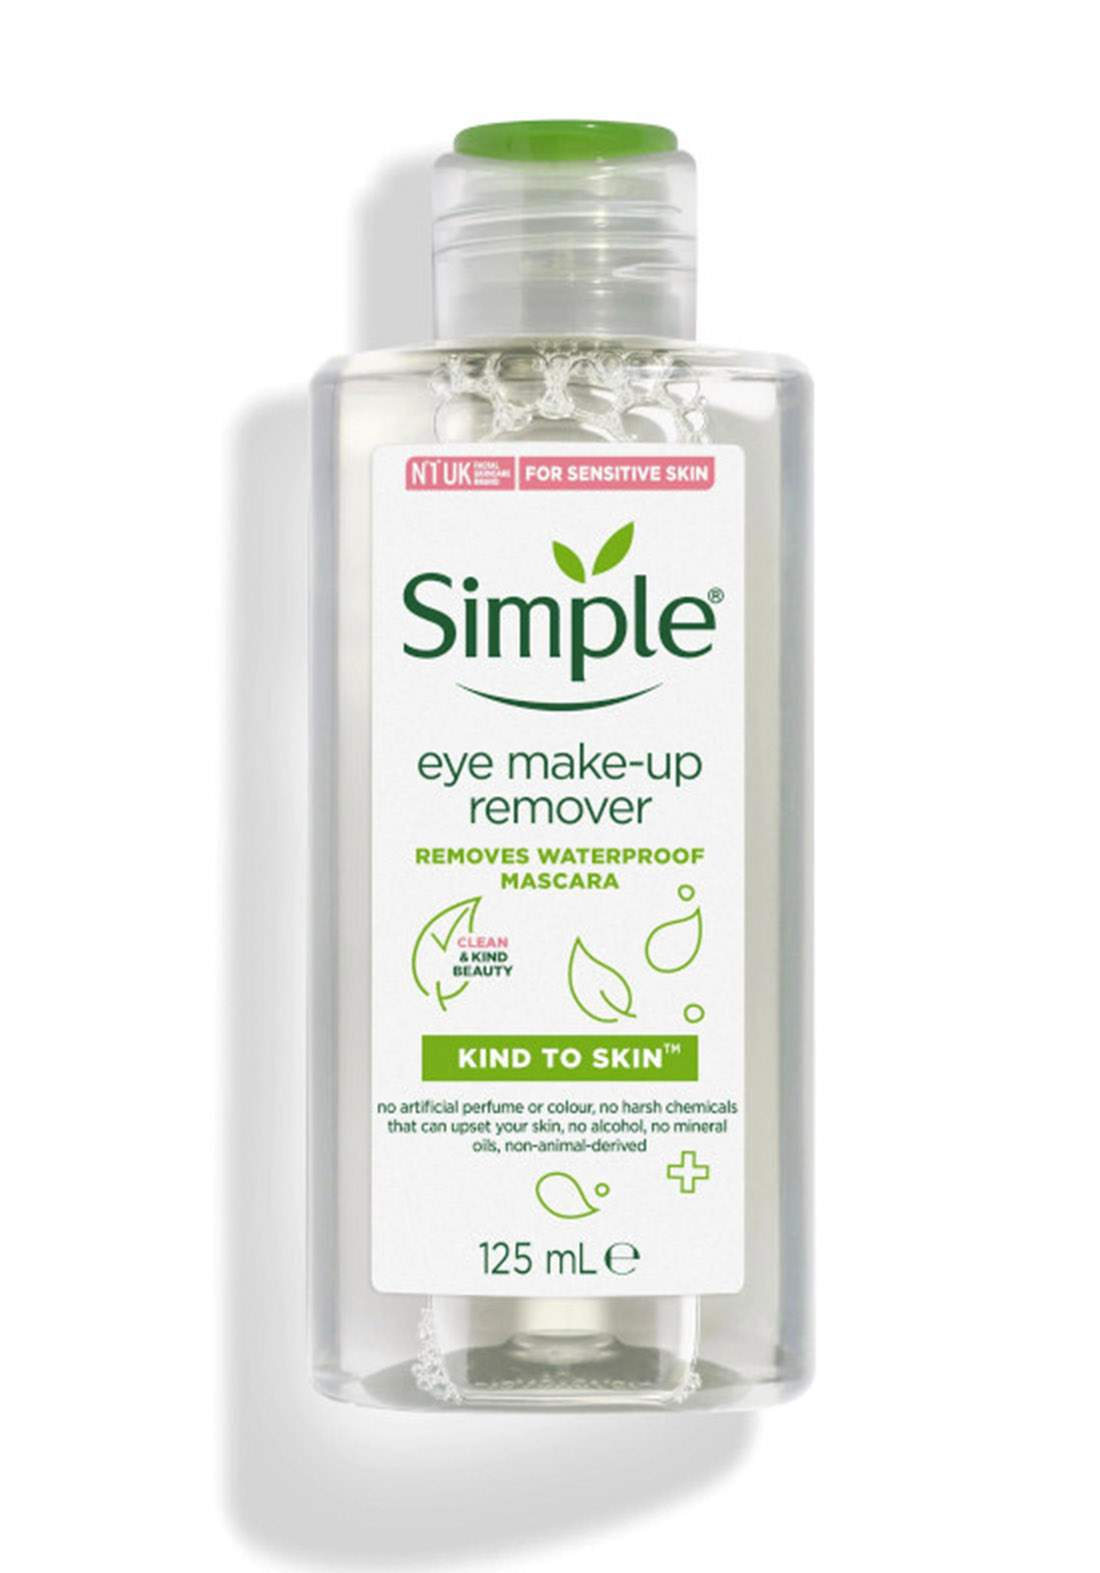 Simple (968438529) Kind To Skin Eye Make-Up Remover - 125ml  مزيل المكياج